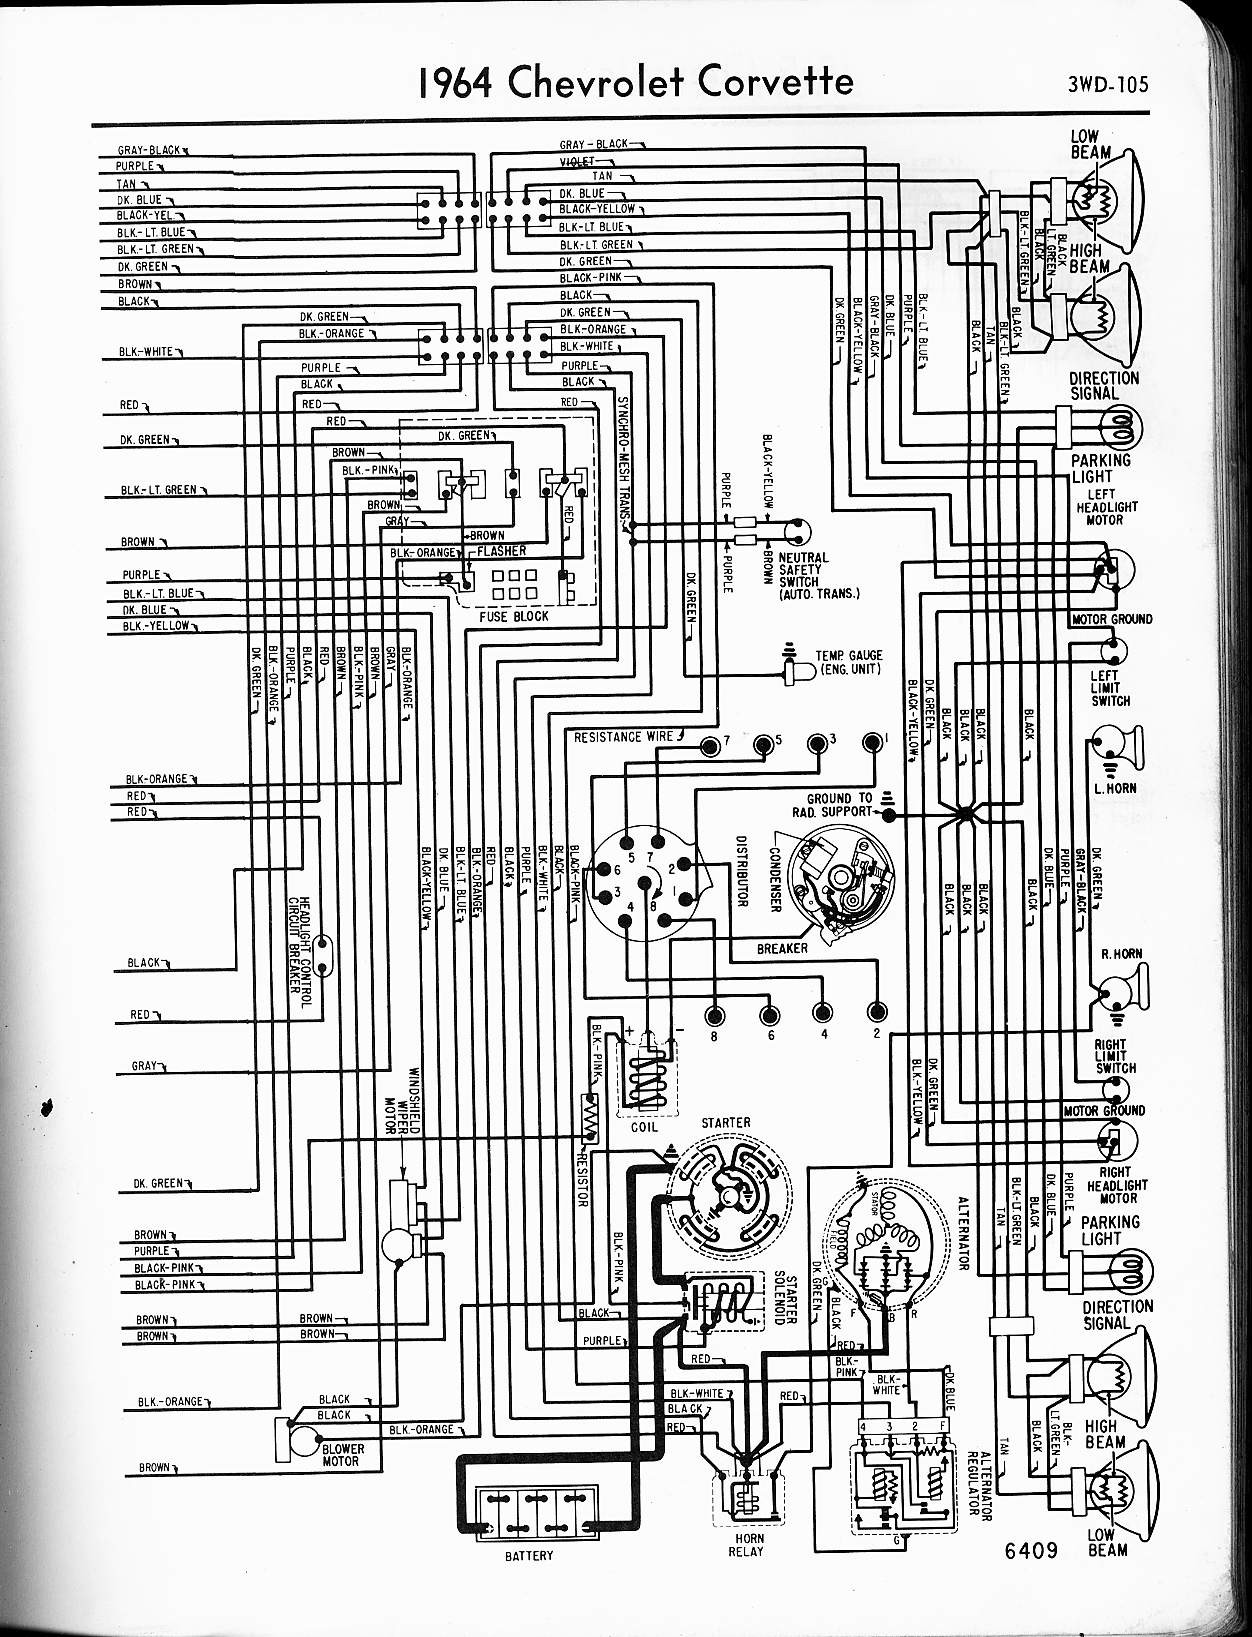 1964 Impala Ss Wiring Harness Diagram Schematics 2005 Engine Chevrolet Chevy Sedan 2007